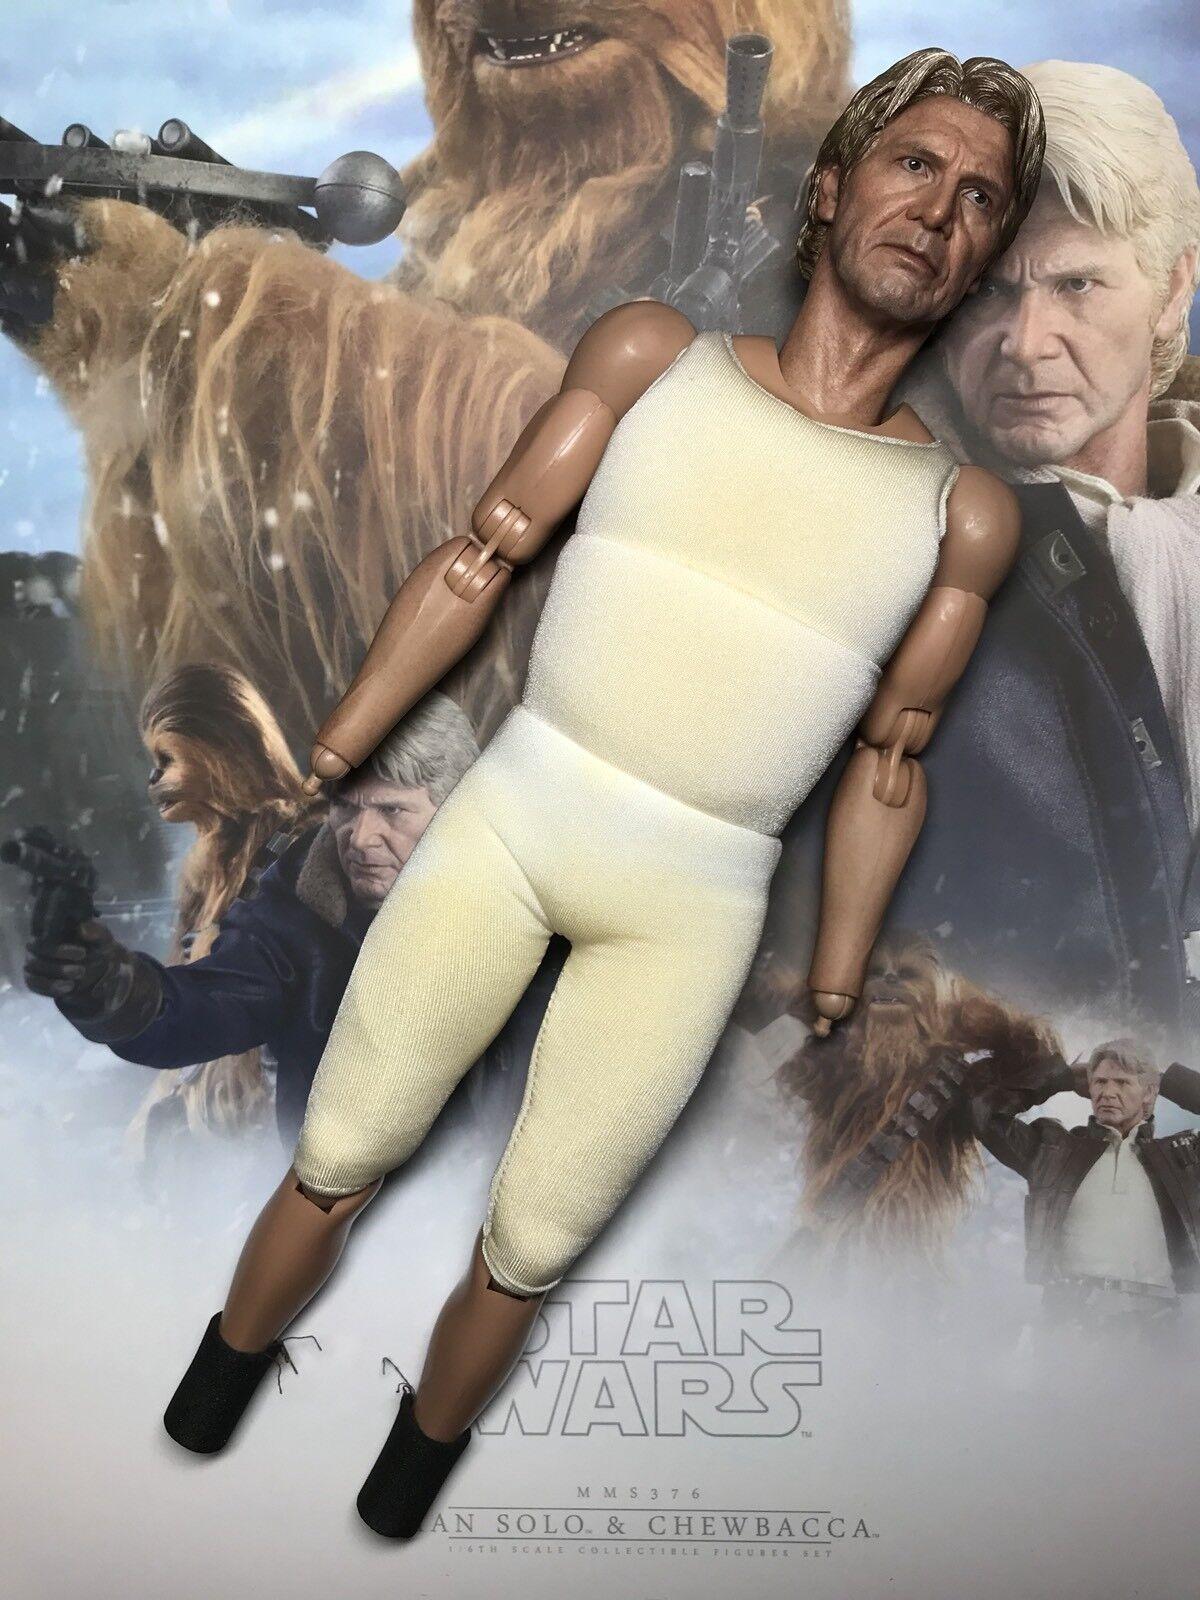 Hot Toys MMS376 Star Wars Han Solo & Chewbacca 1 6 Han solo Body W  Head